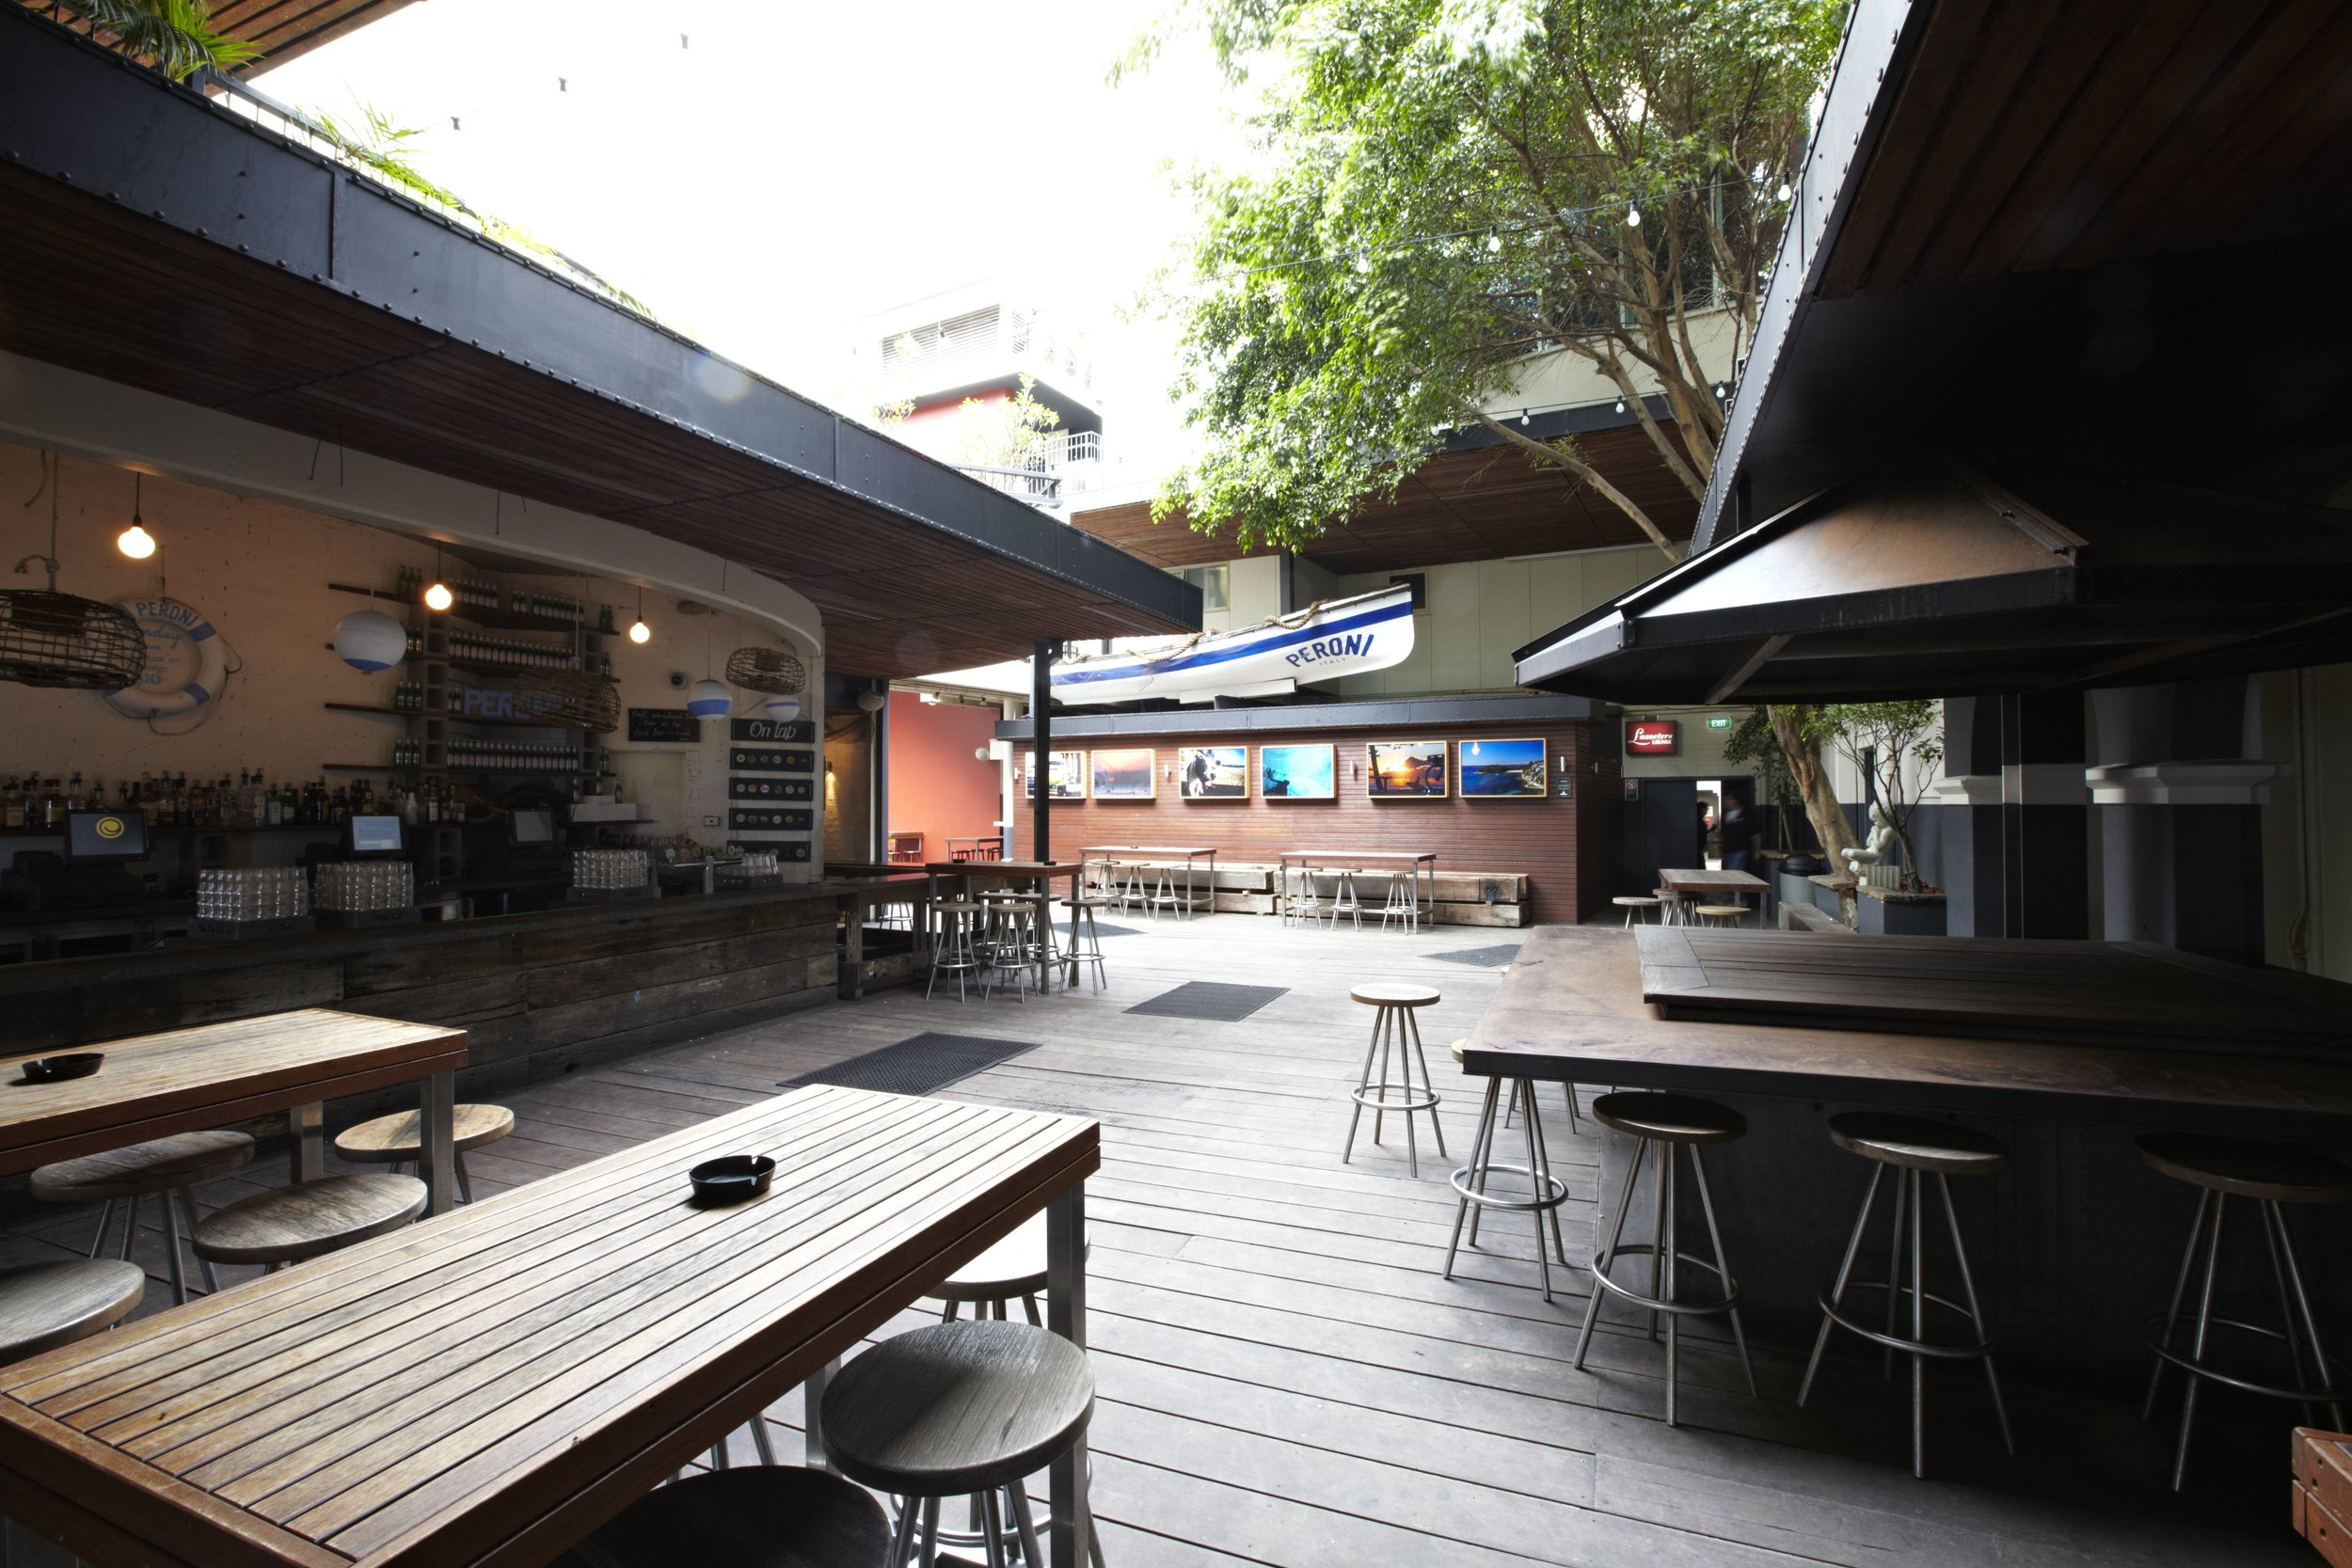 Hotel Steyne Peroni Bar Beer Garden